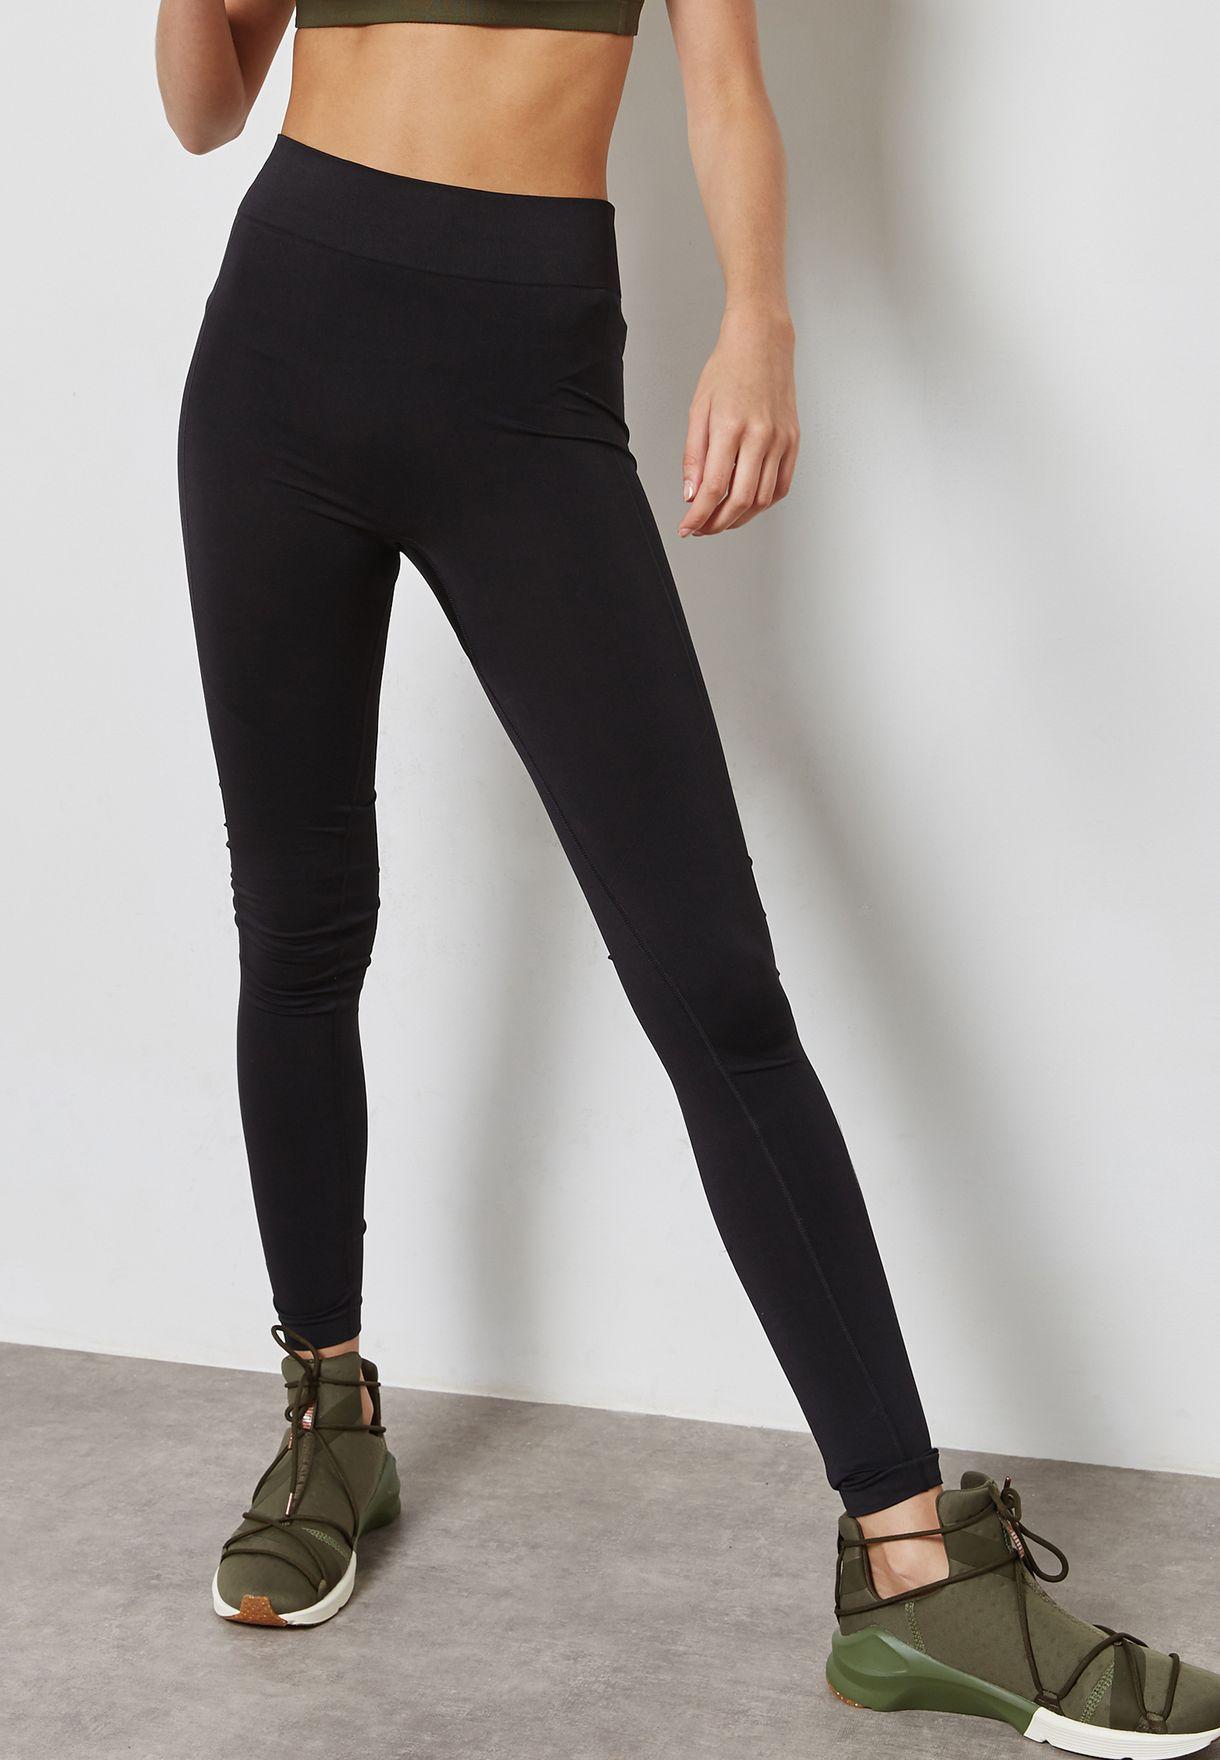 a863adc8a7ecfd Shop PUMA black evoKNIT Leggings 59233301 for Women in UAE ...